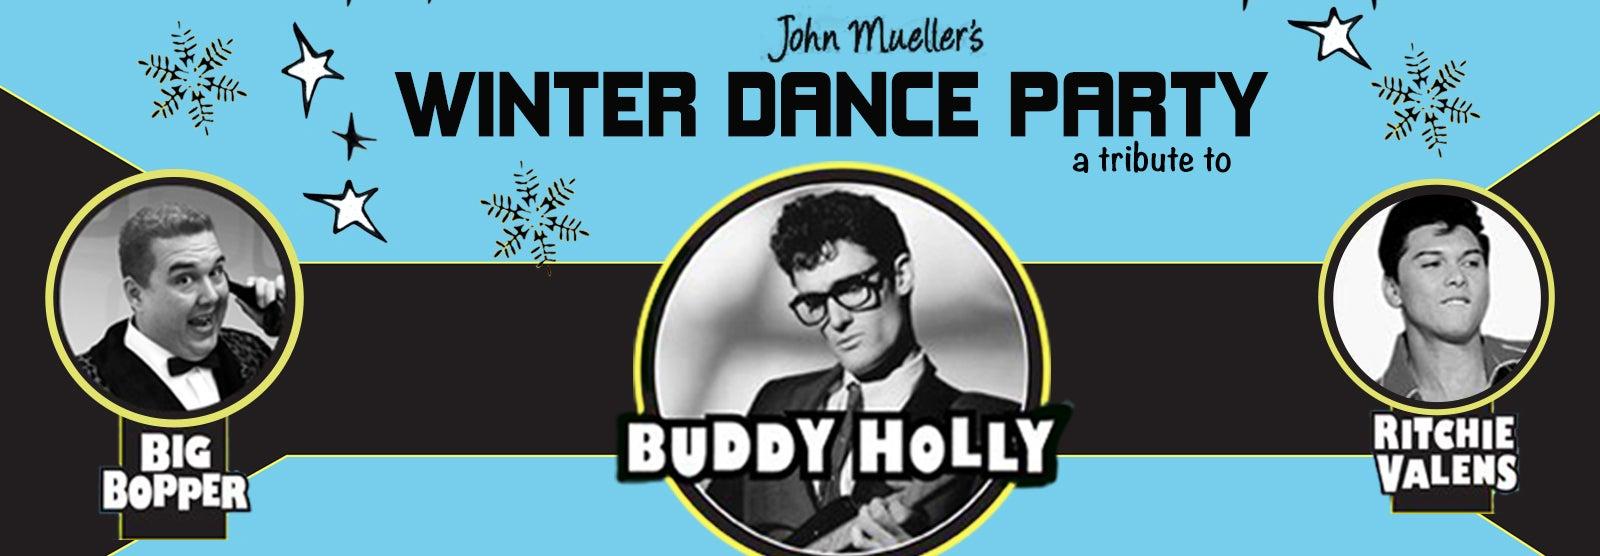 John Mueller's Winter Dance Party